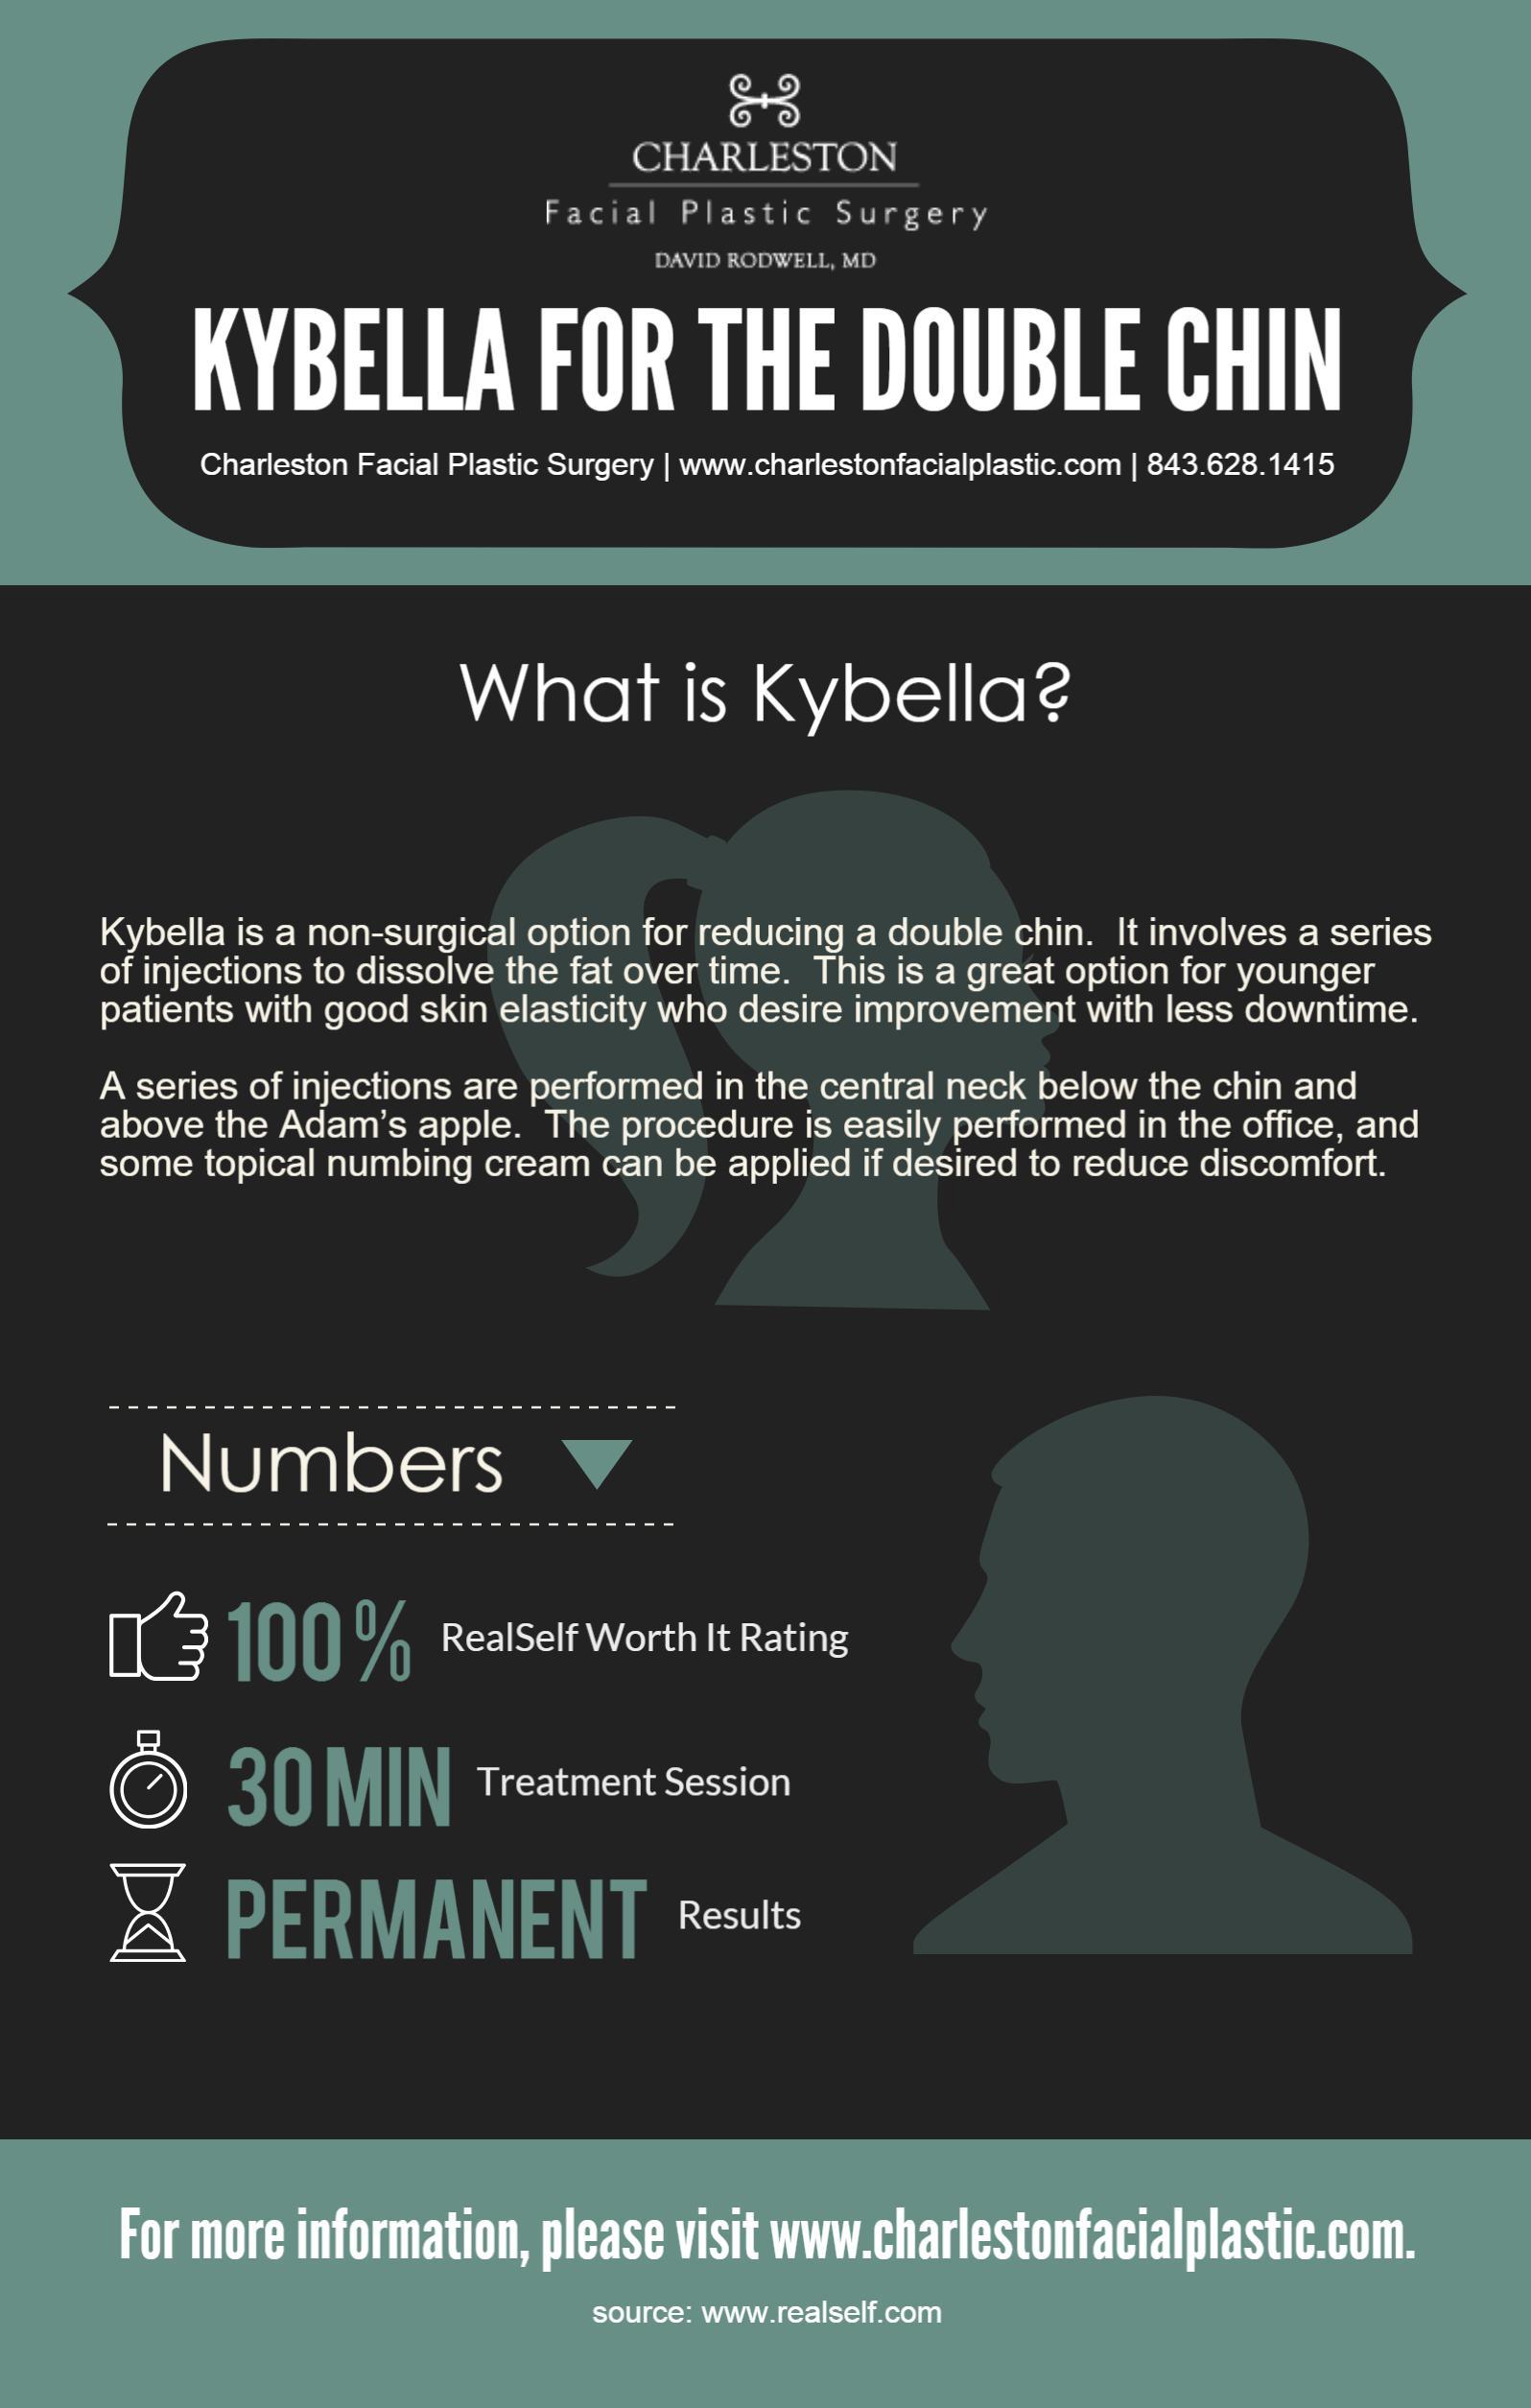 Rodwell - Kybella